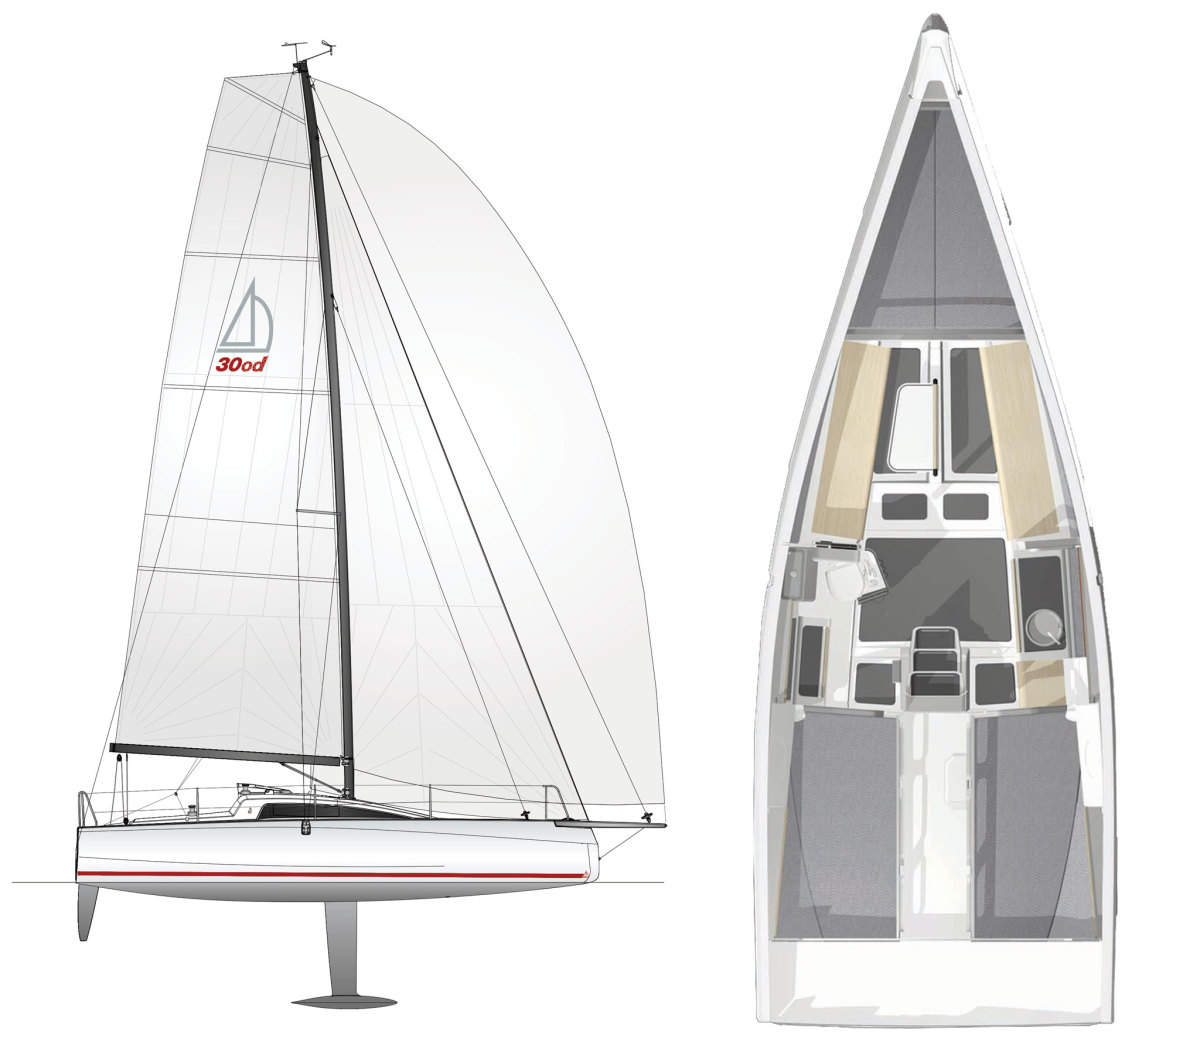 Dehler_30od_technical_Sail_plan-190903-1